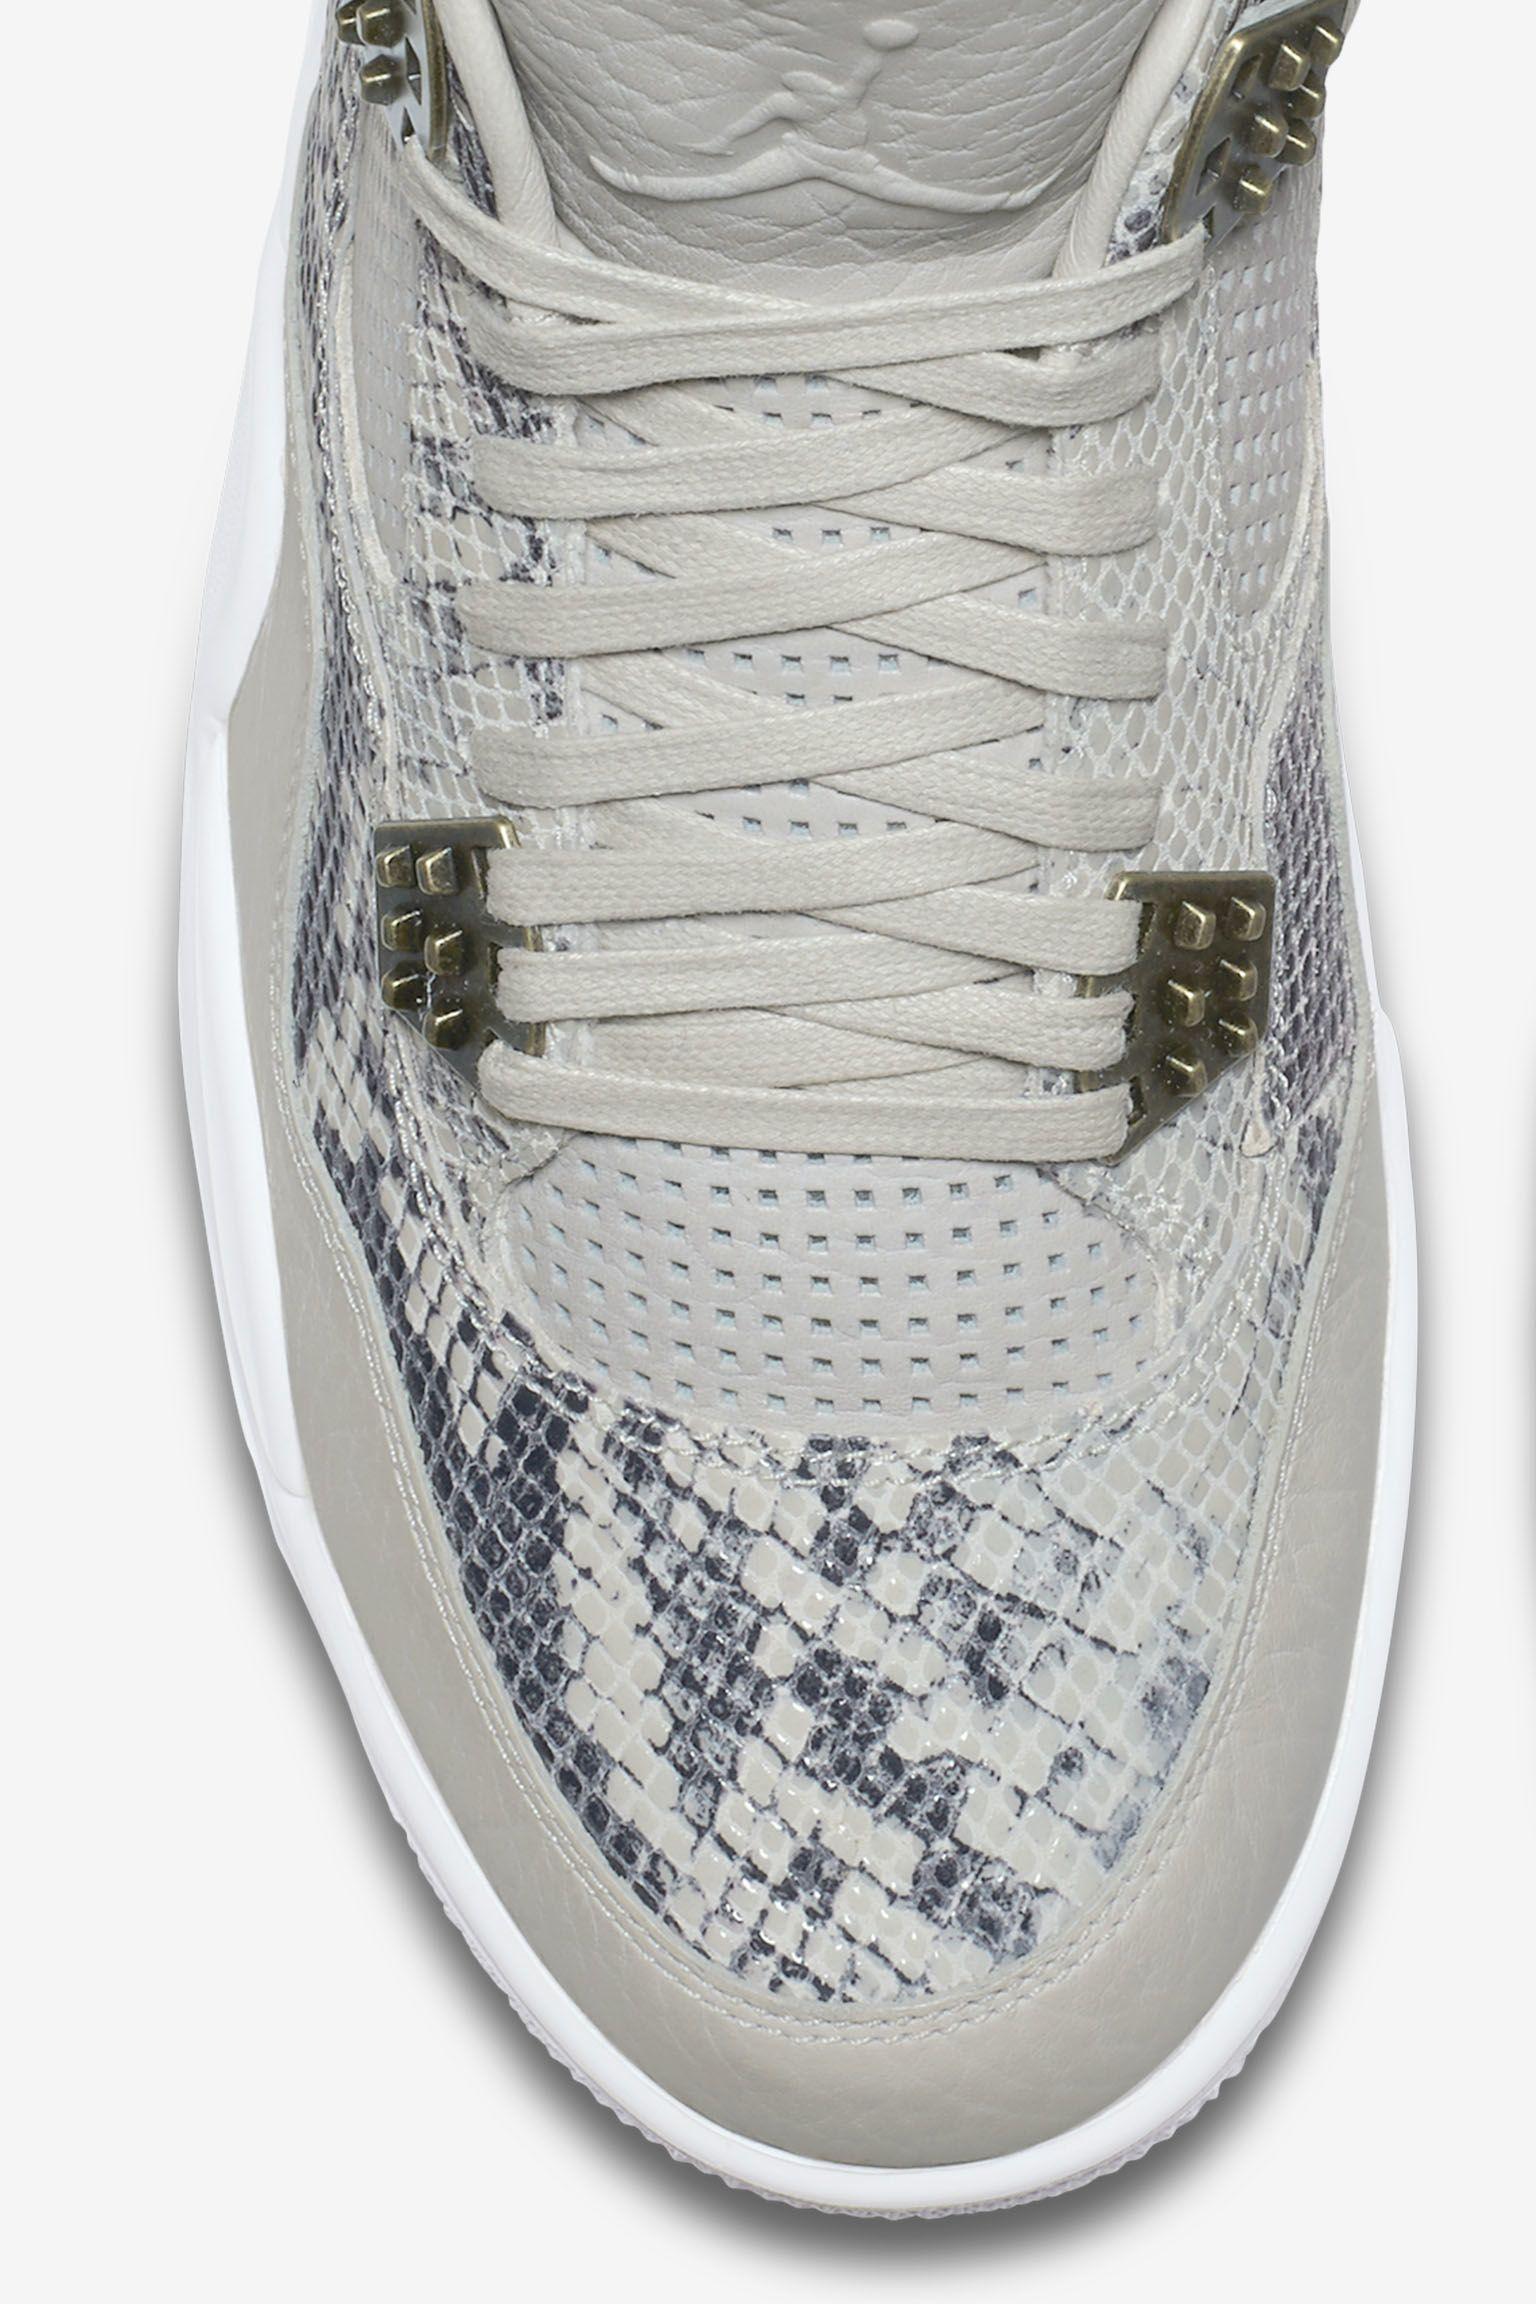 Air Jordan 4 Retro 'Snakeskin' Release Date